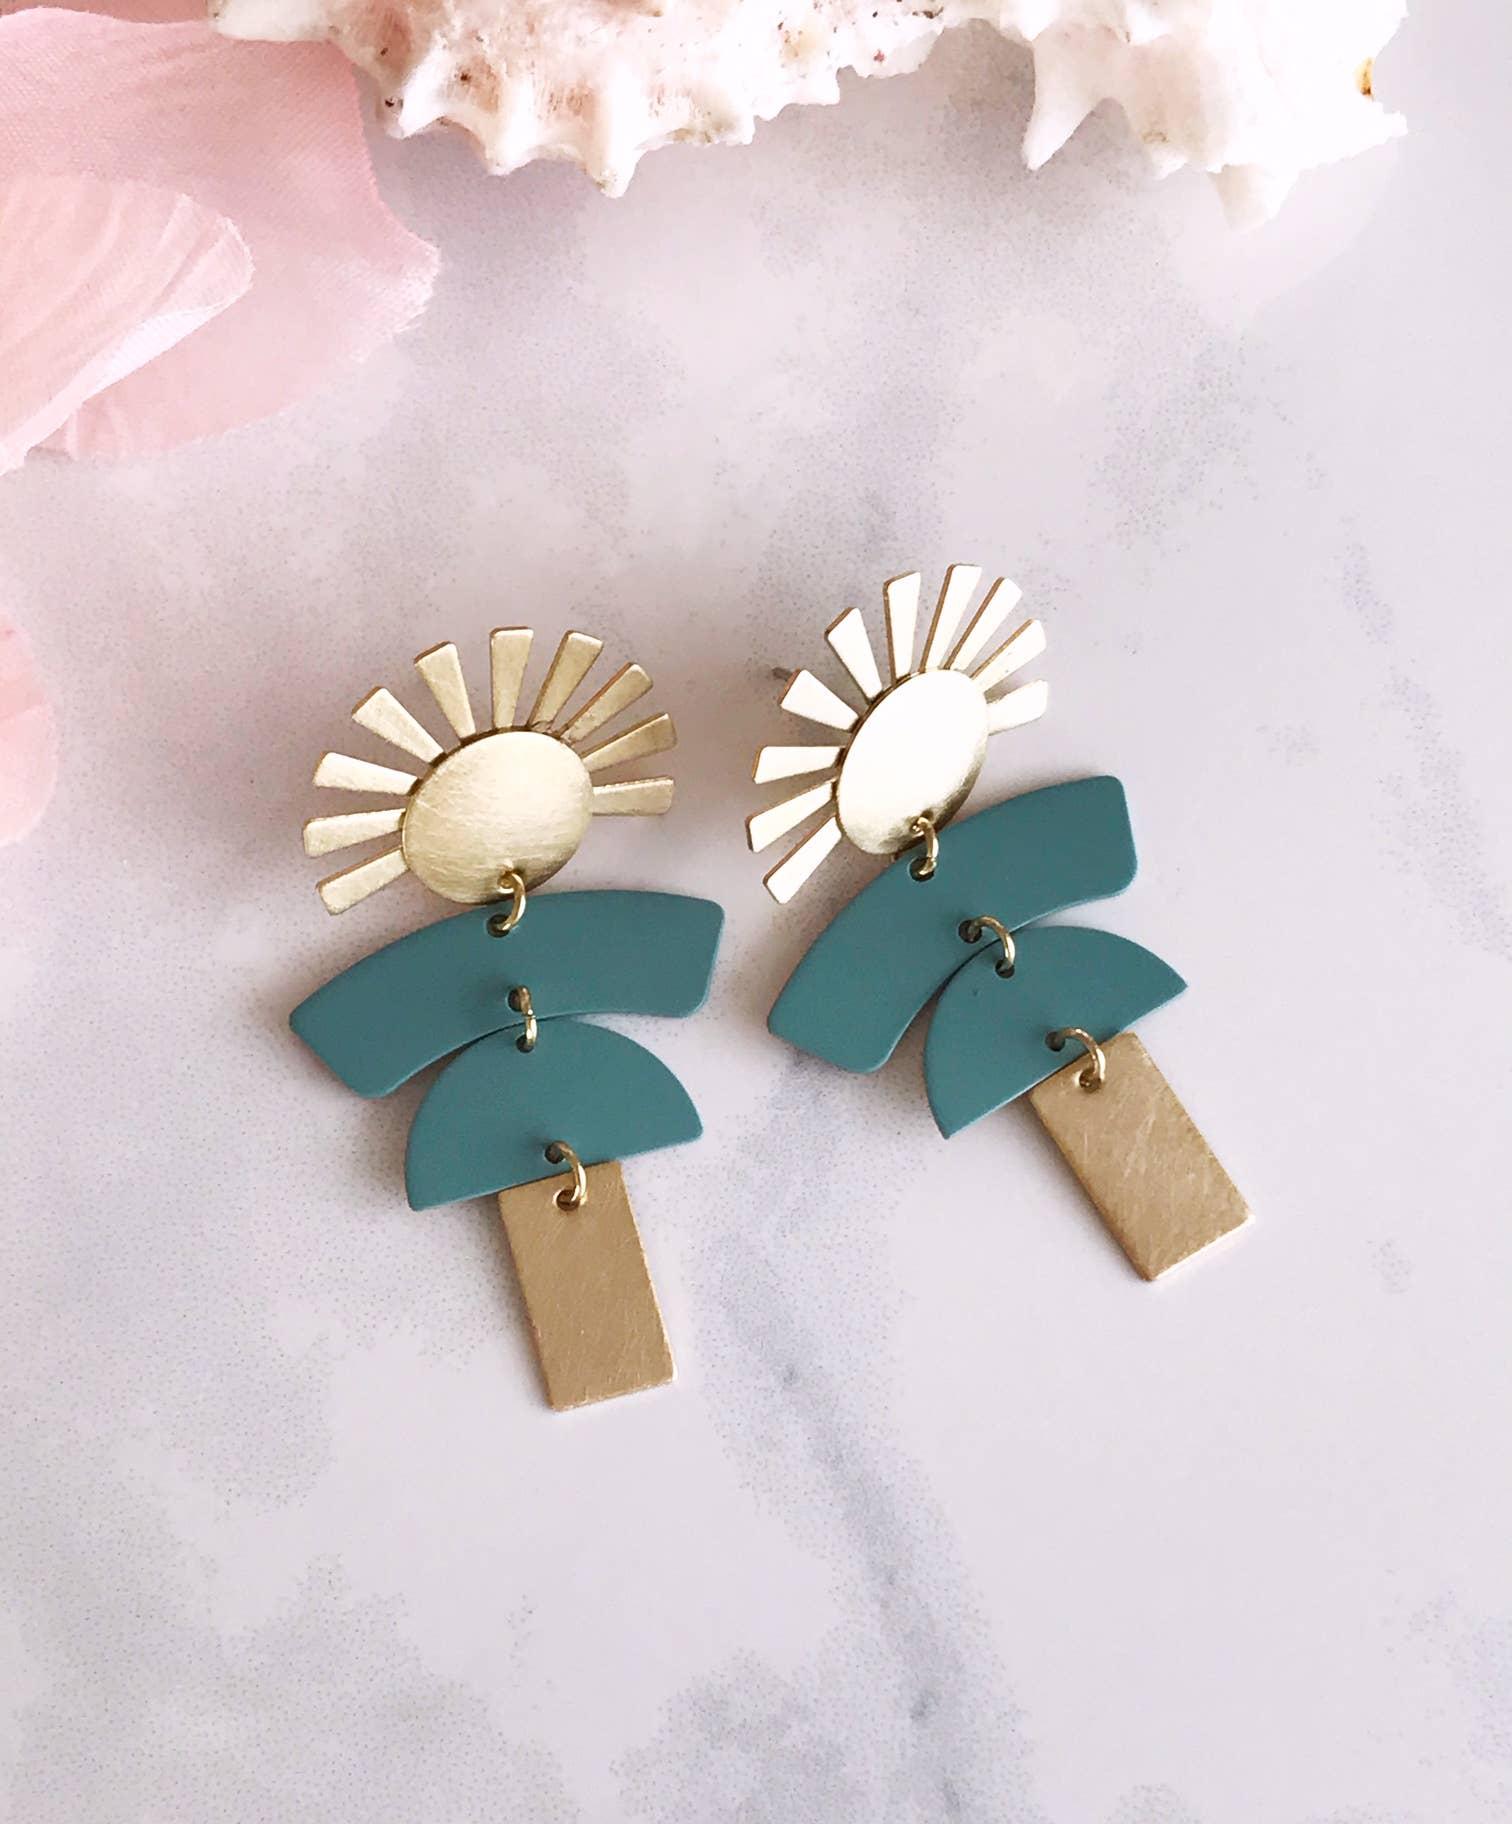 kachina doll earrings - brushed brass / sage   Trada Marketplace